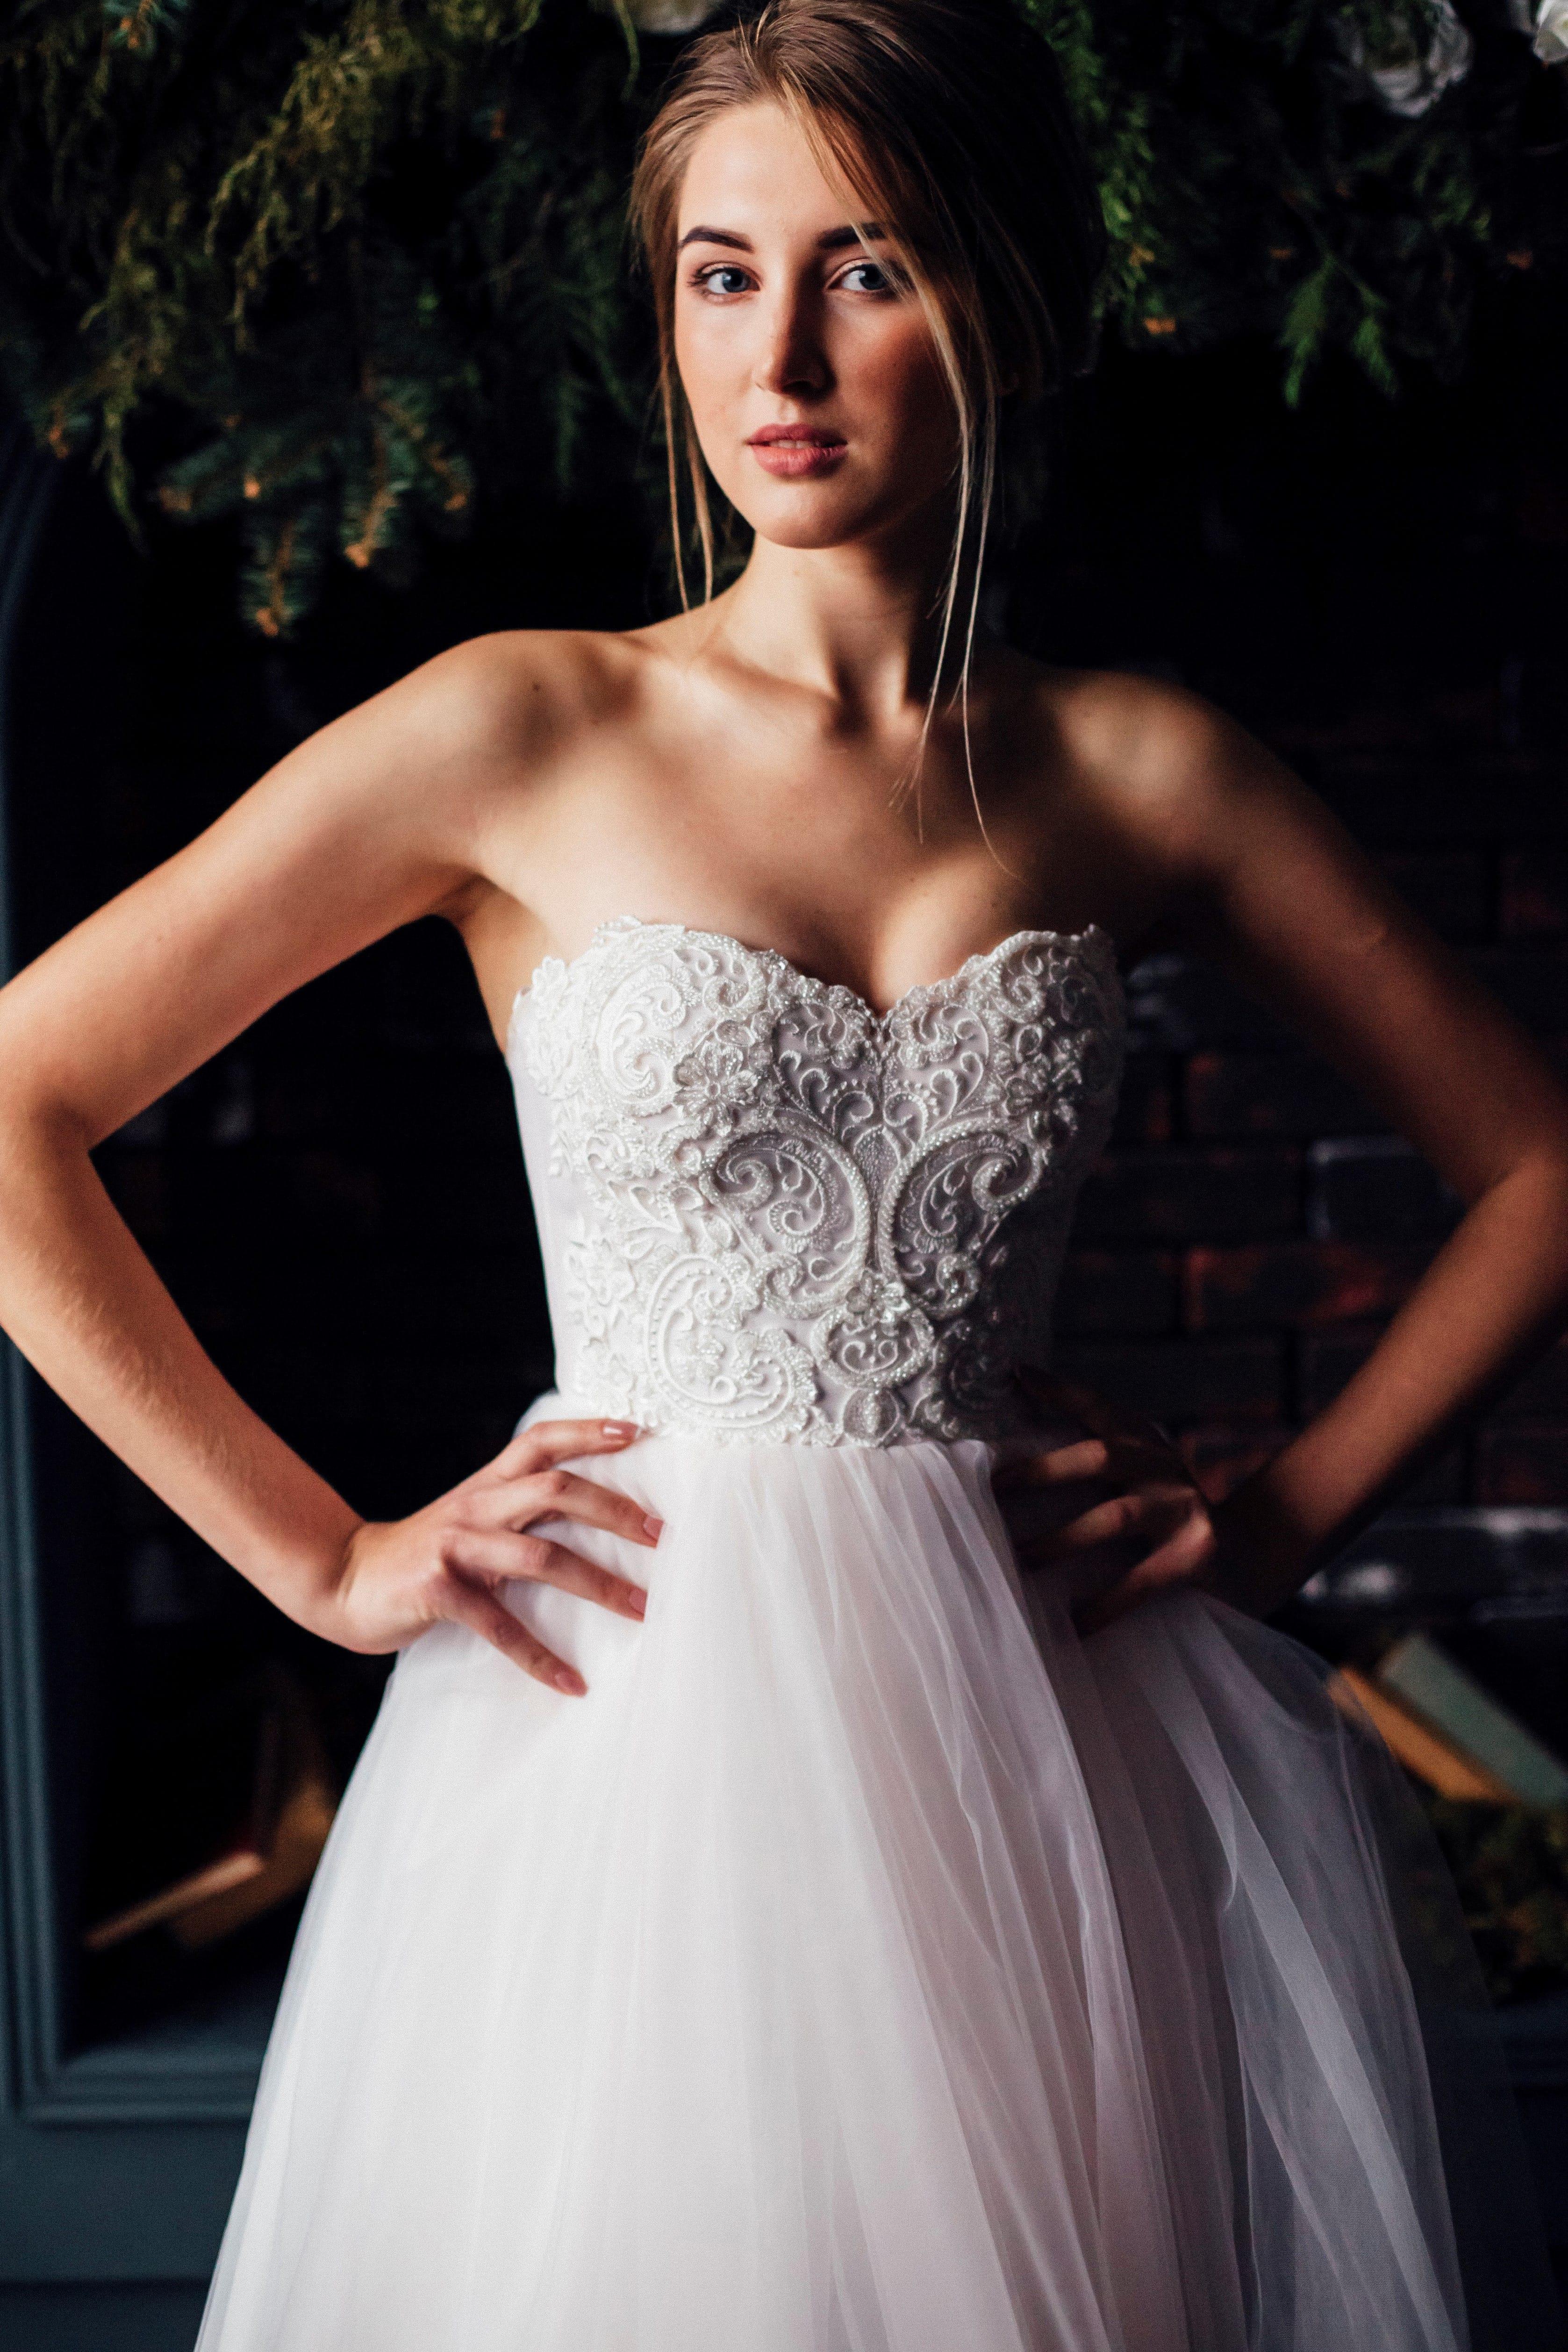 Свадебное платье VANESSA, коллекция THE ABSOLUTE LOVE, бренд RARE BRIDAL, фото 1